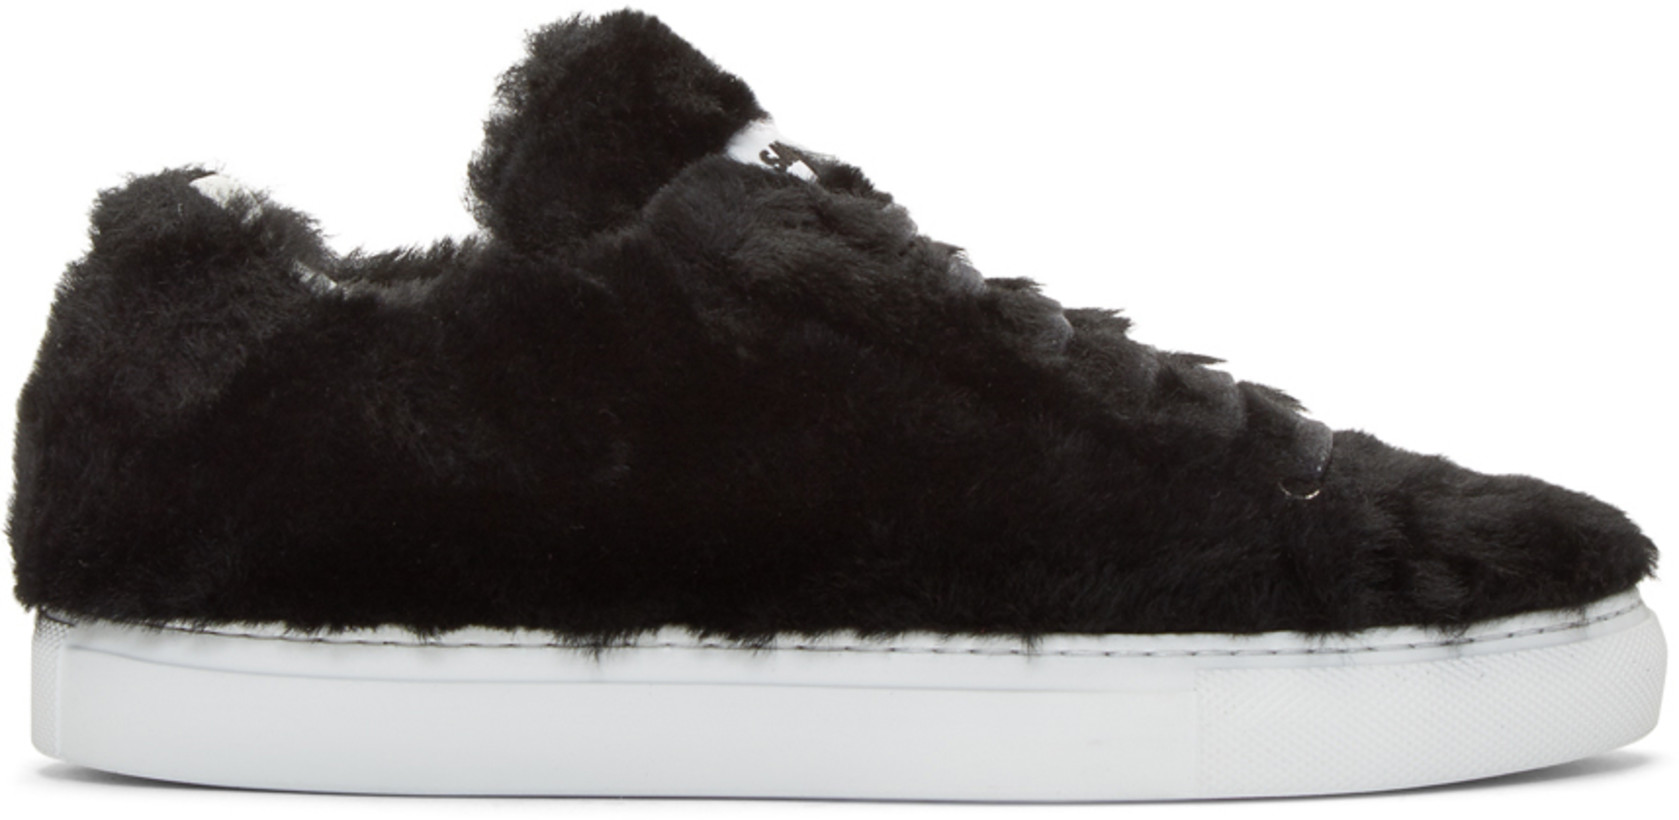 Jil Sander Black Shearling Sneakers